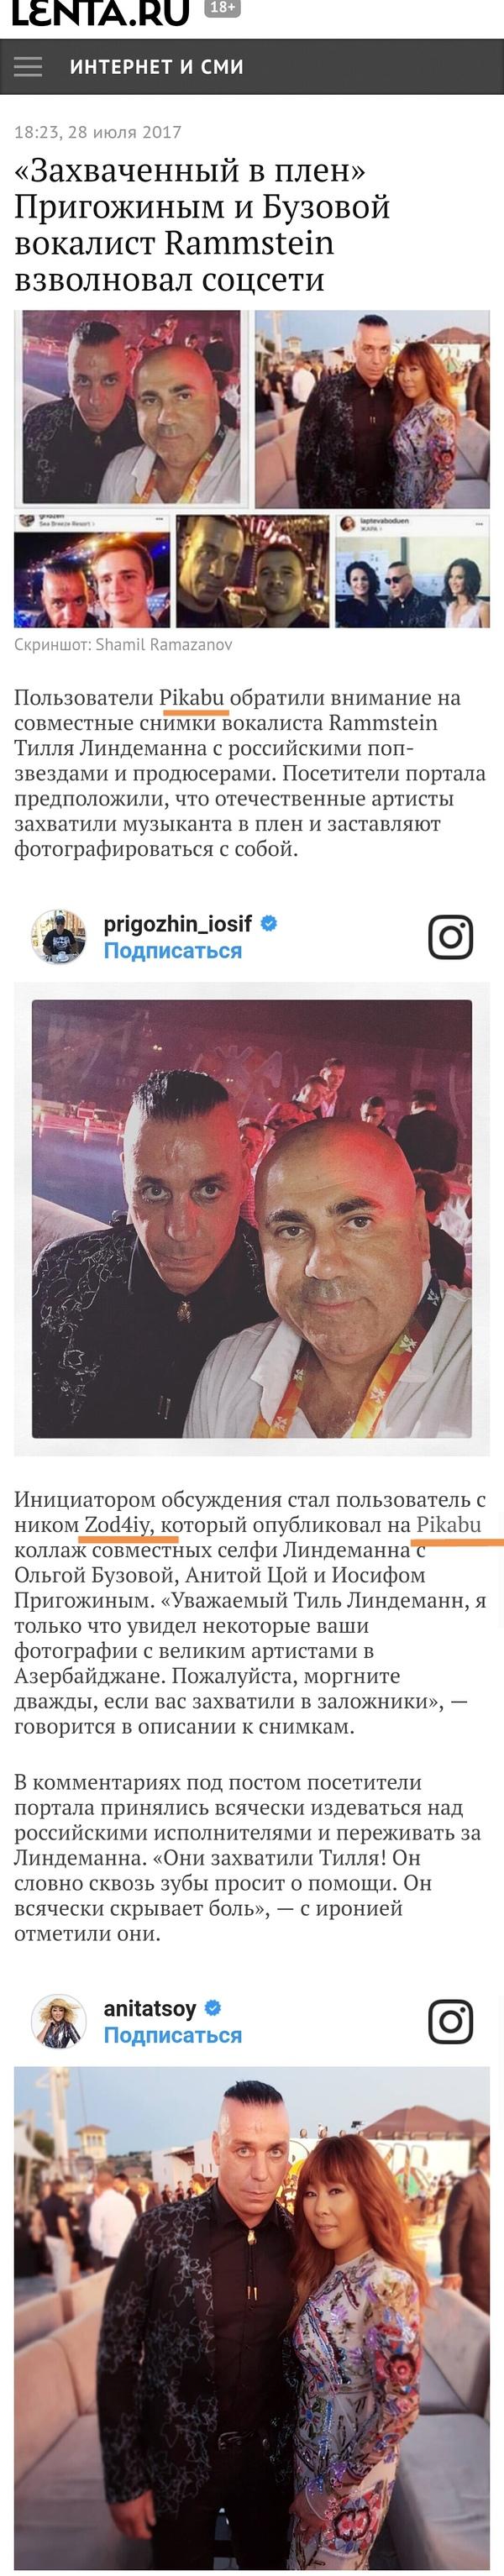 Пикабу на lenta.ru пикабу, лента, Rammstein, длиннопост